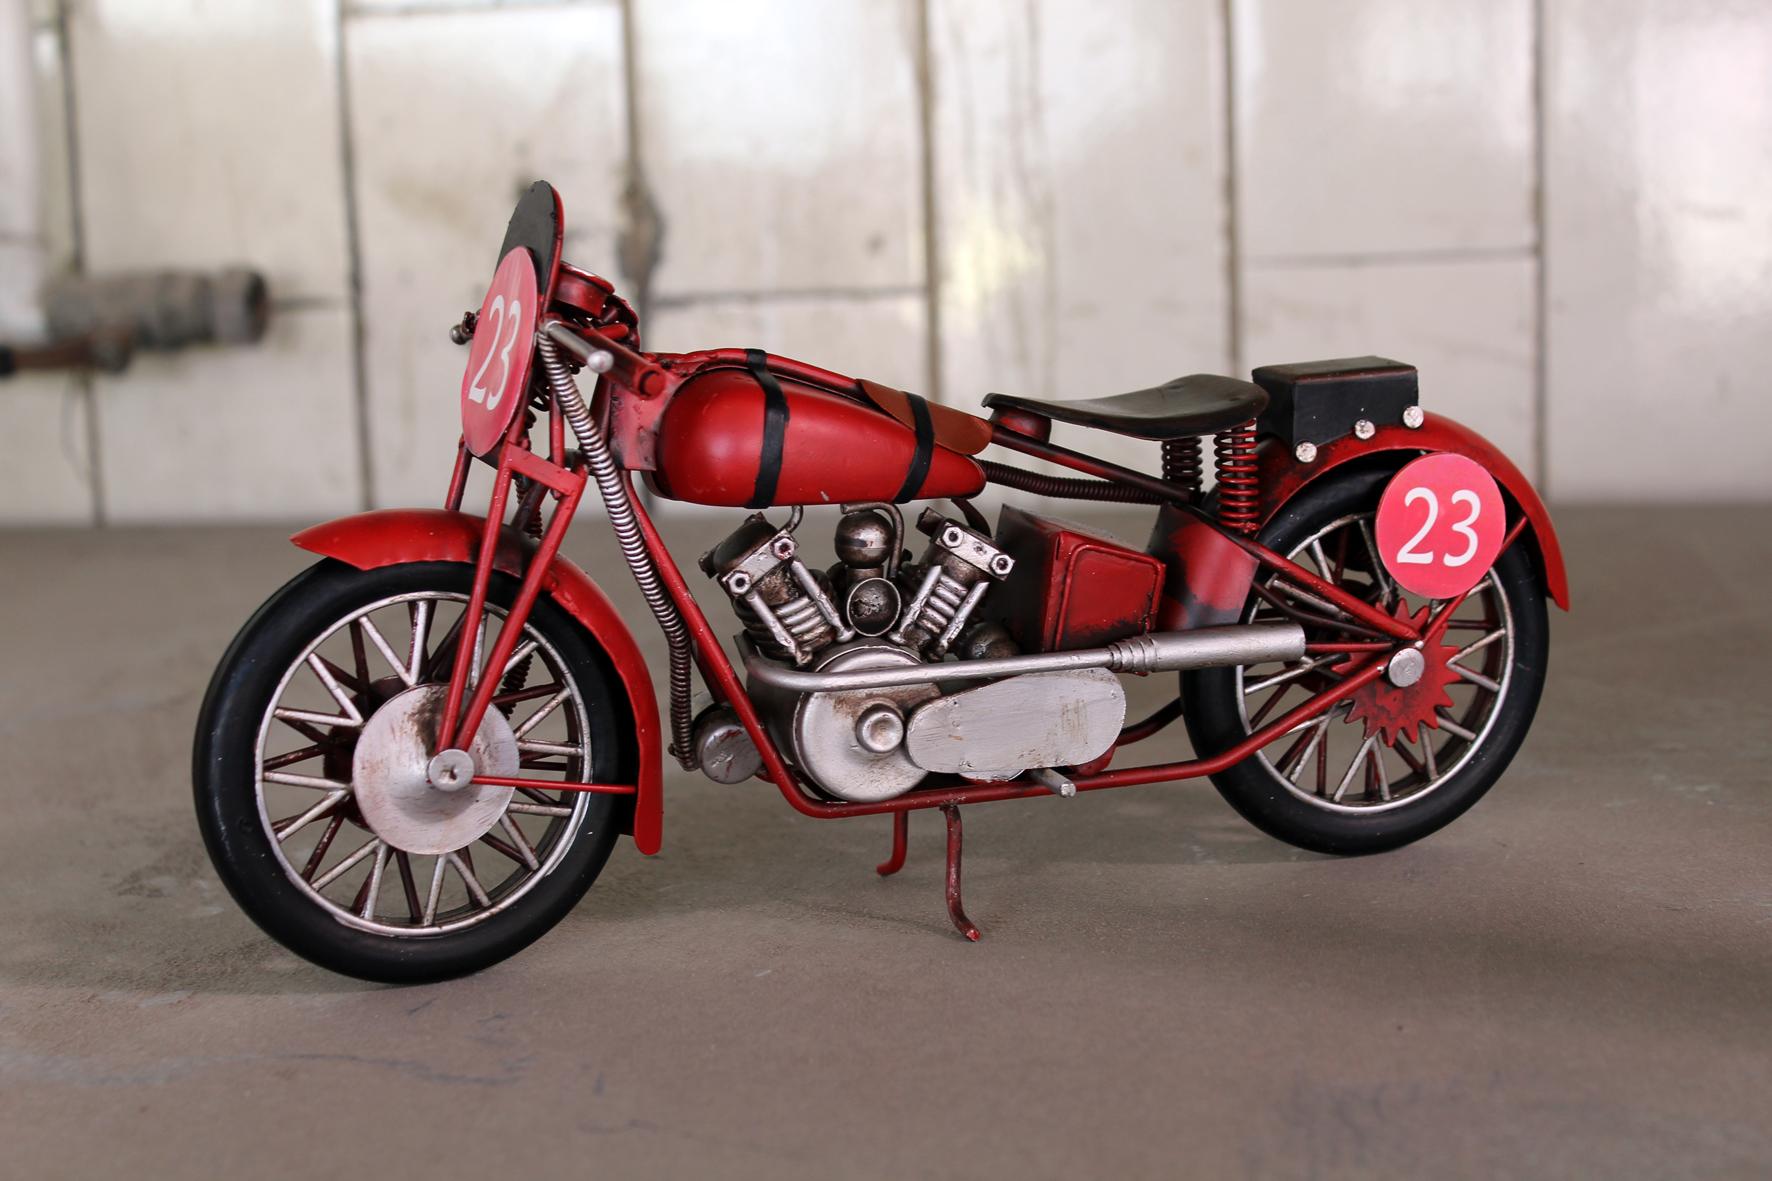 haus und garten schmuck modell motorrad oldtimer. Black Bedroom Furniture Sets. Home Design Ideas